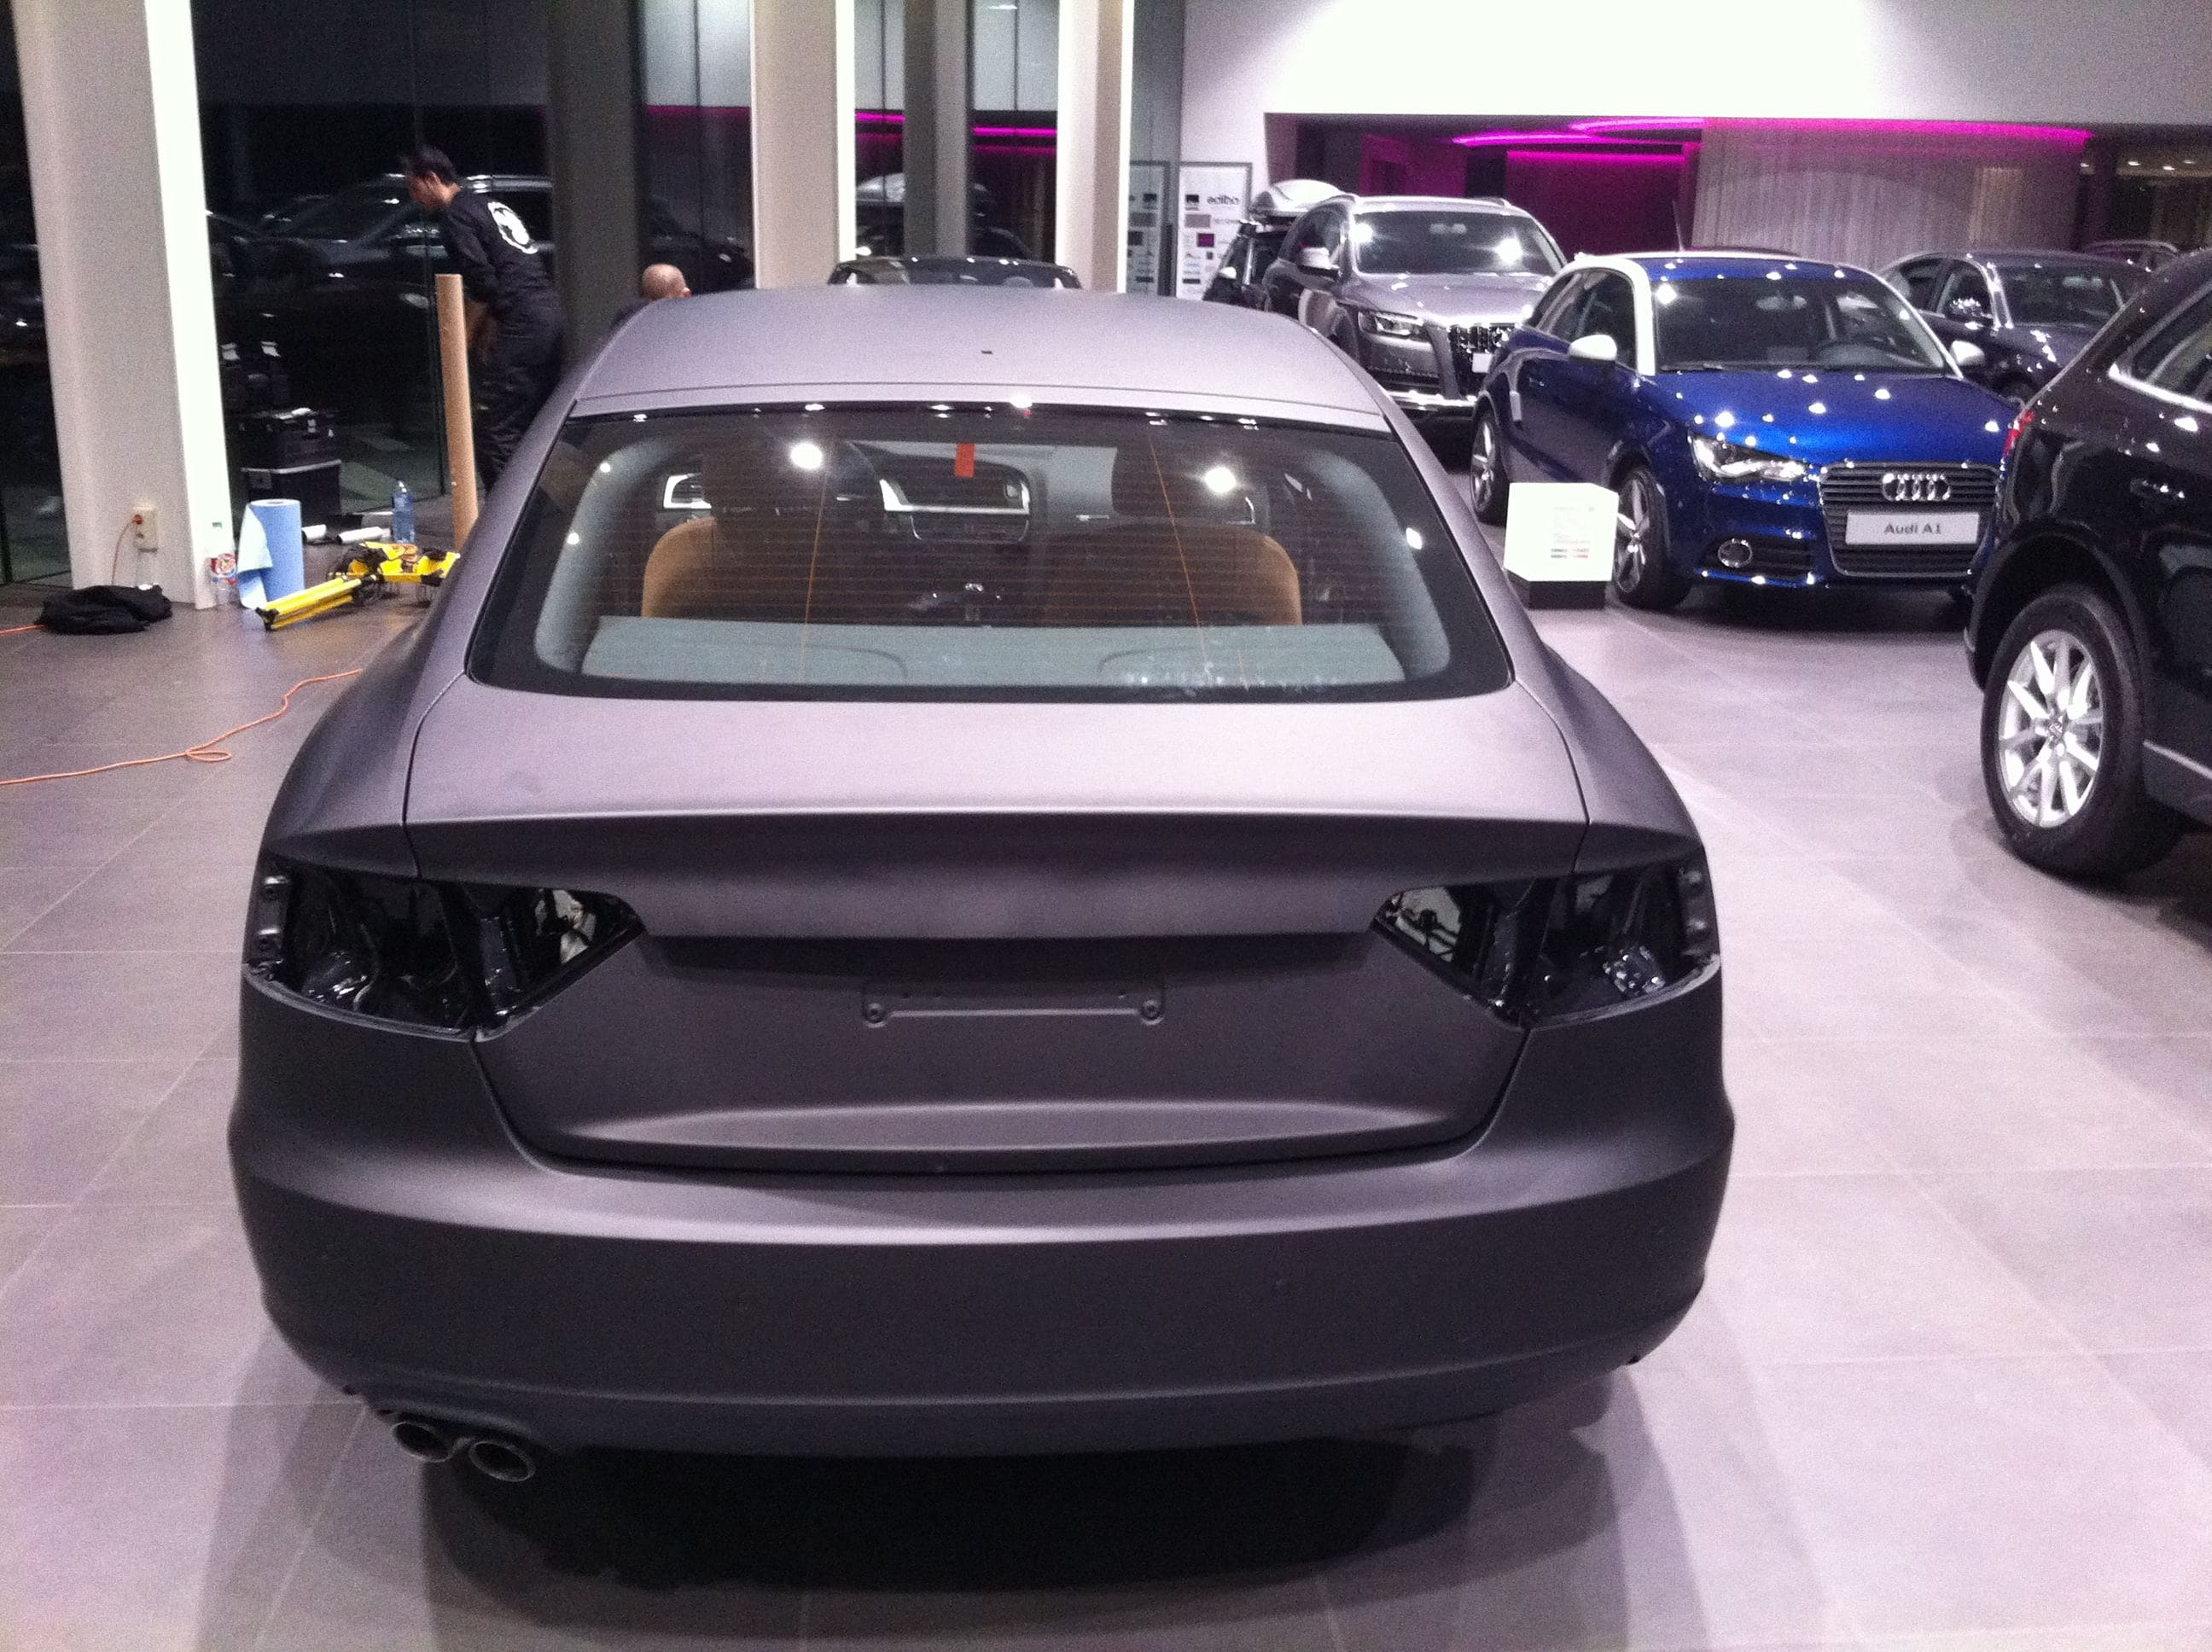 Audi A5 Sportback met Mat Grijze Wrap, Carwrapping door Wrapmyride.nu Foto-nr:4788, ©2021